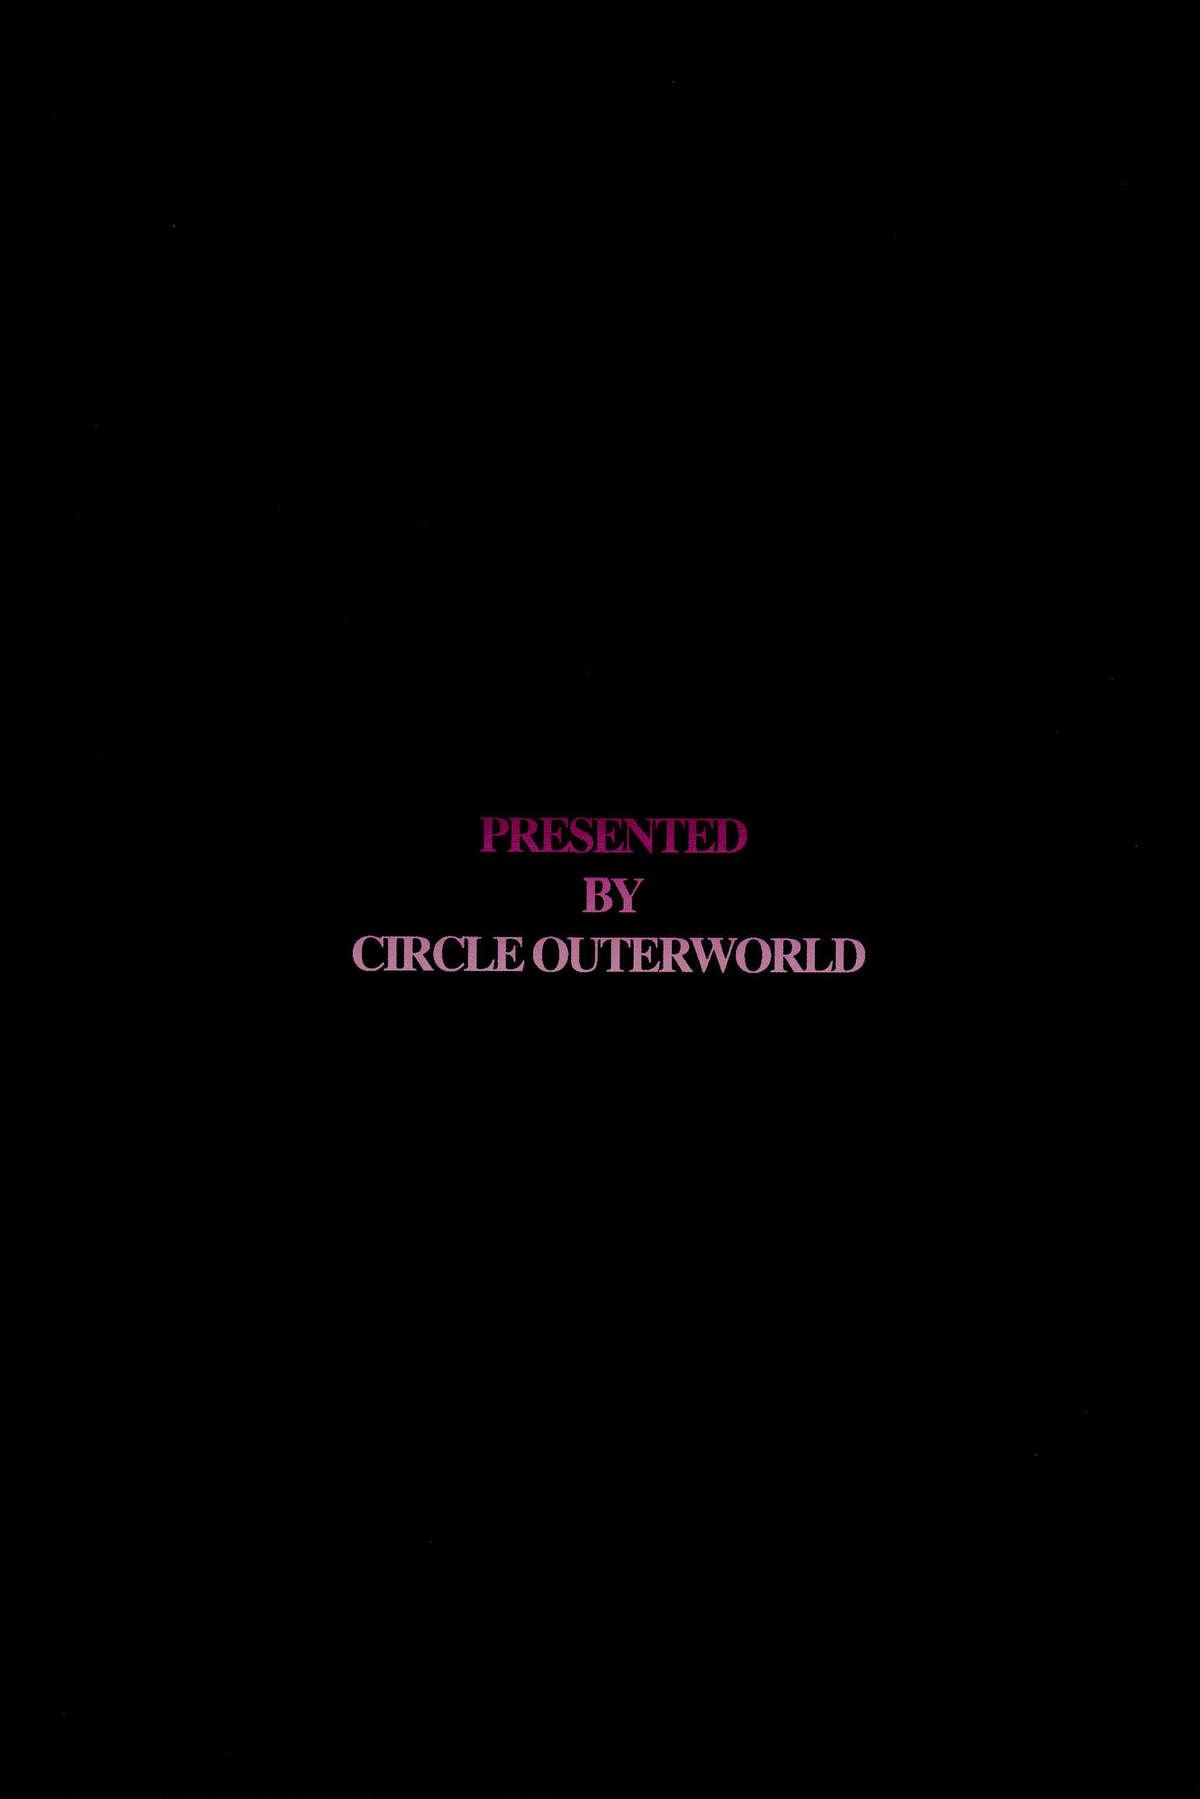 (C63) [CIRCLE OUTERWORLD (Chiba Shuusaku)] Midgard  (Ah! My Goddess) complete [eng] 522